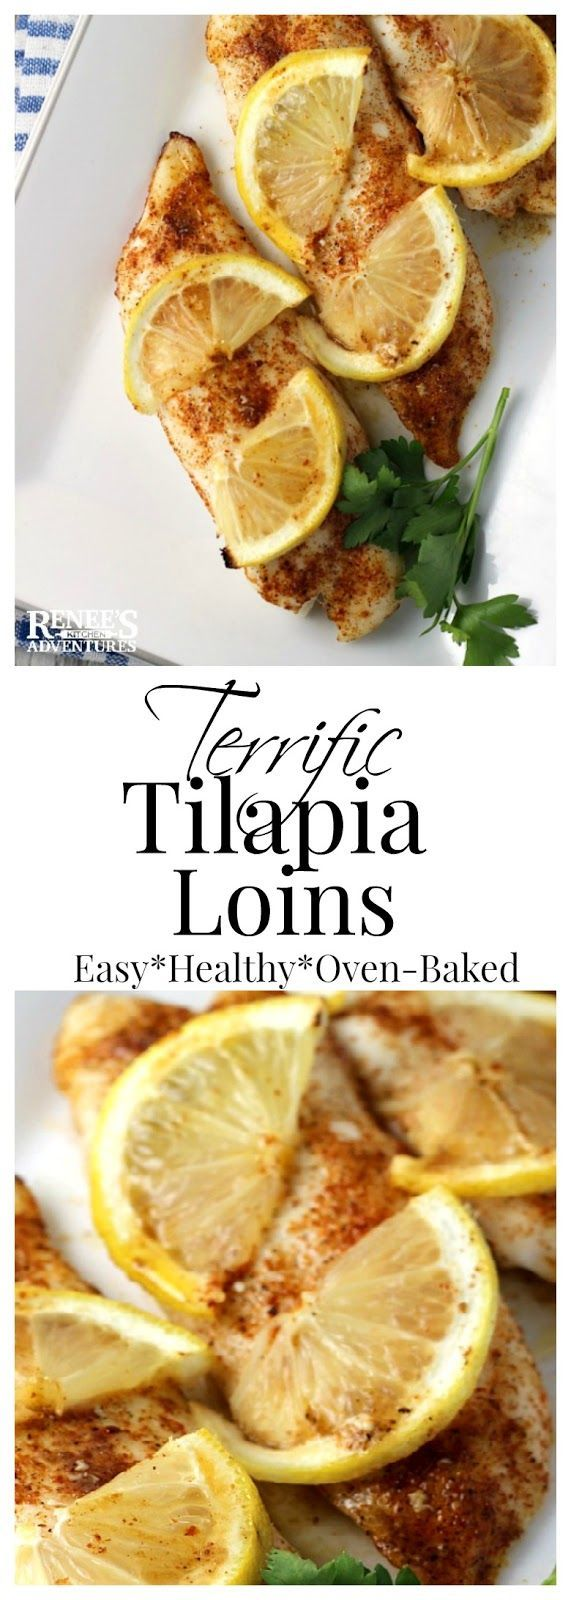 Terrific Tilapia Loins